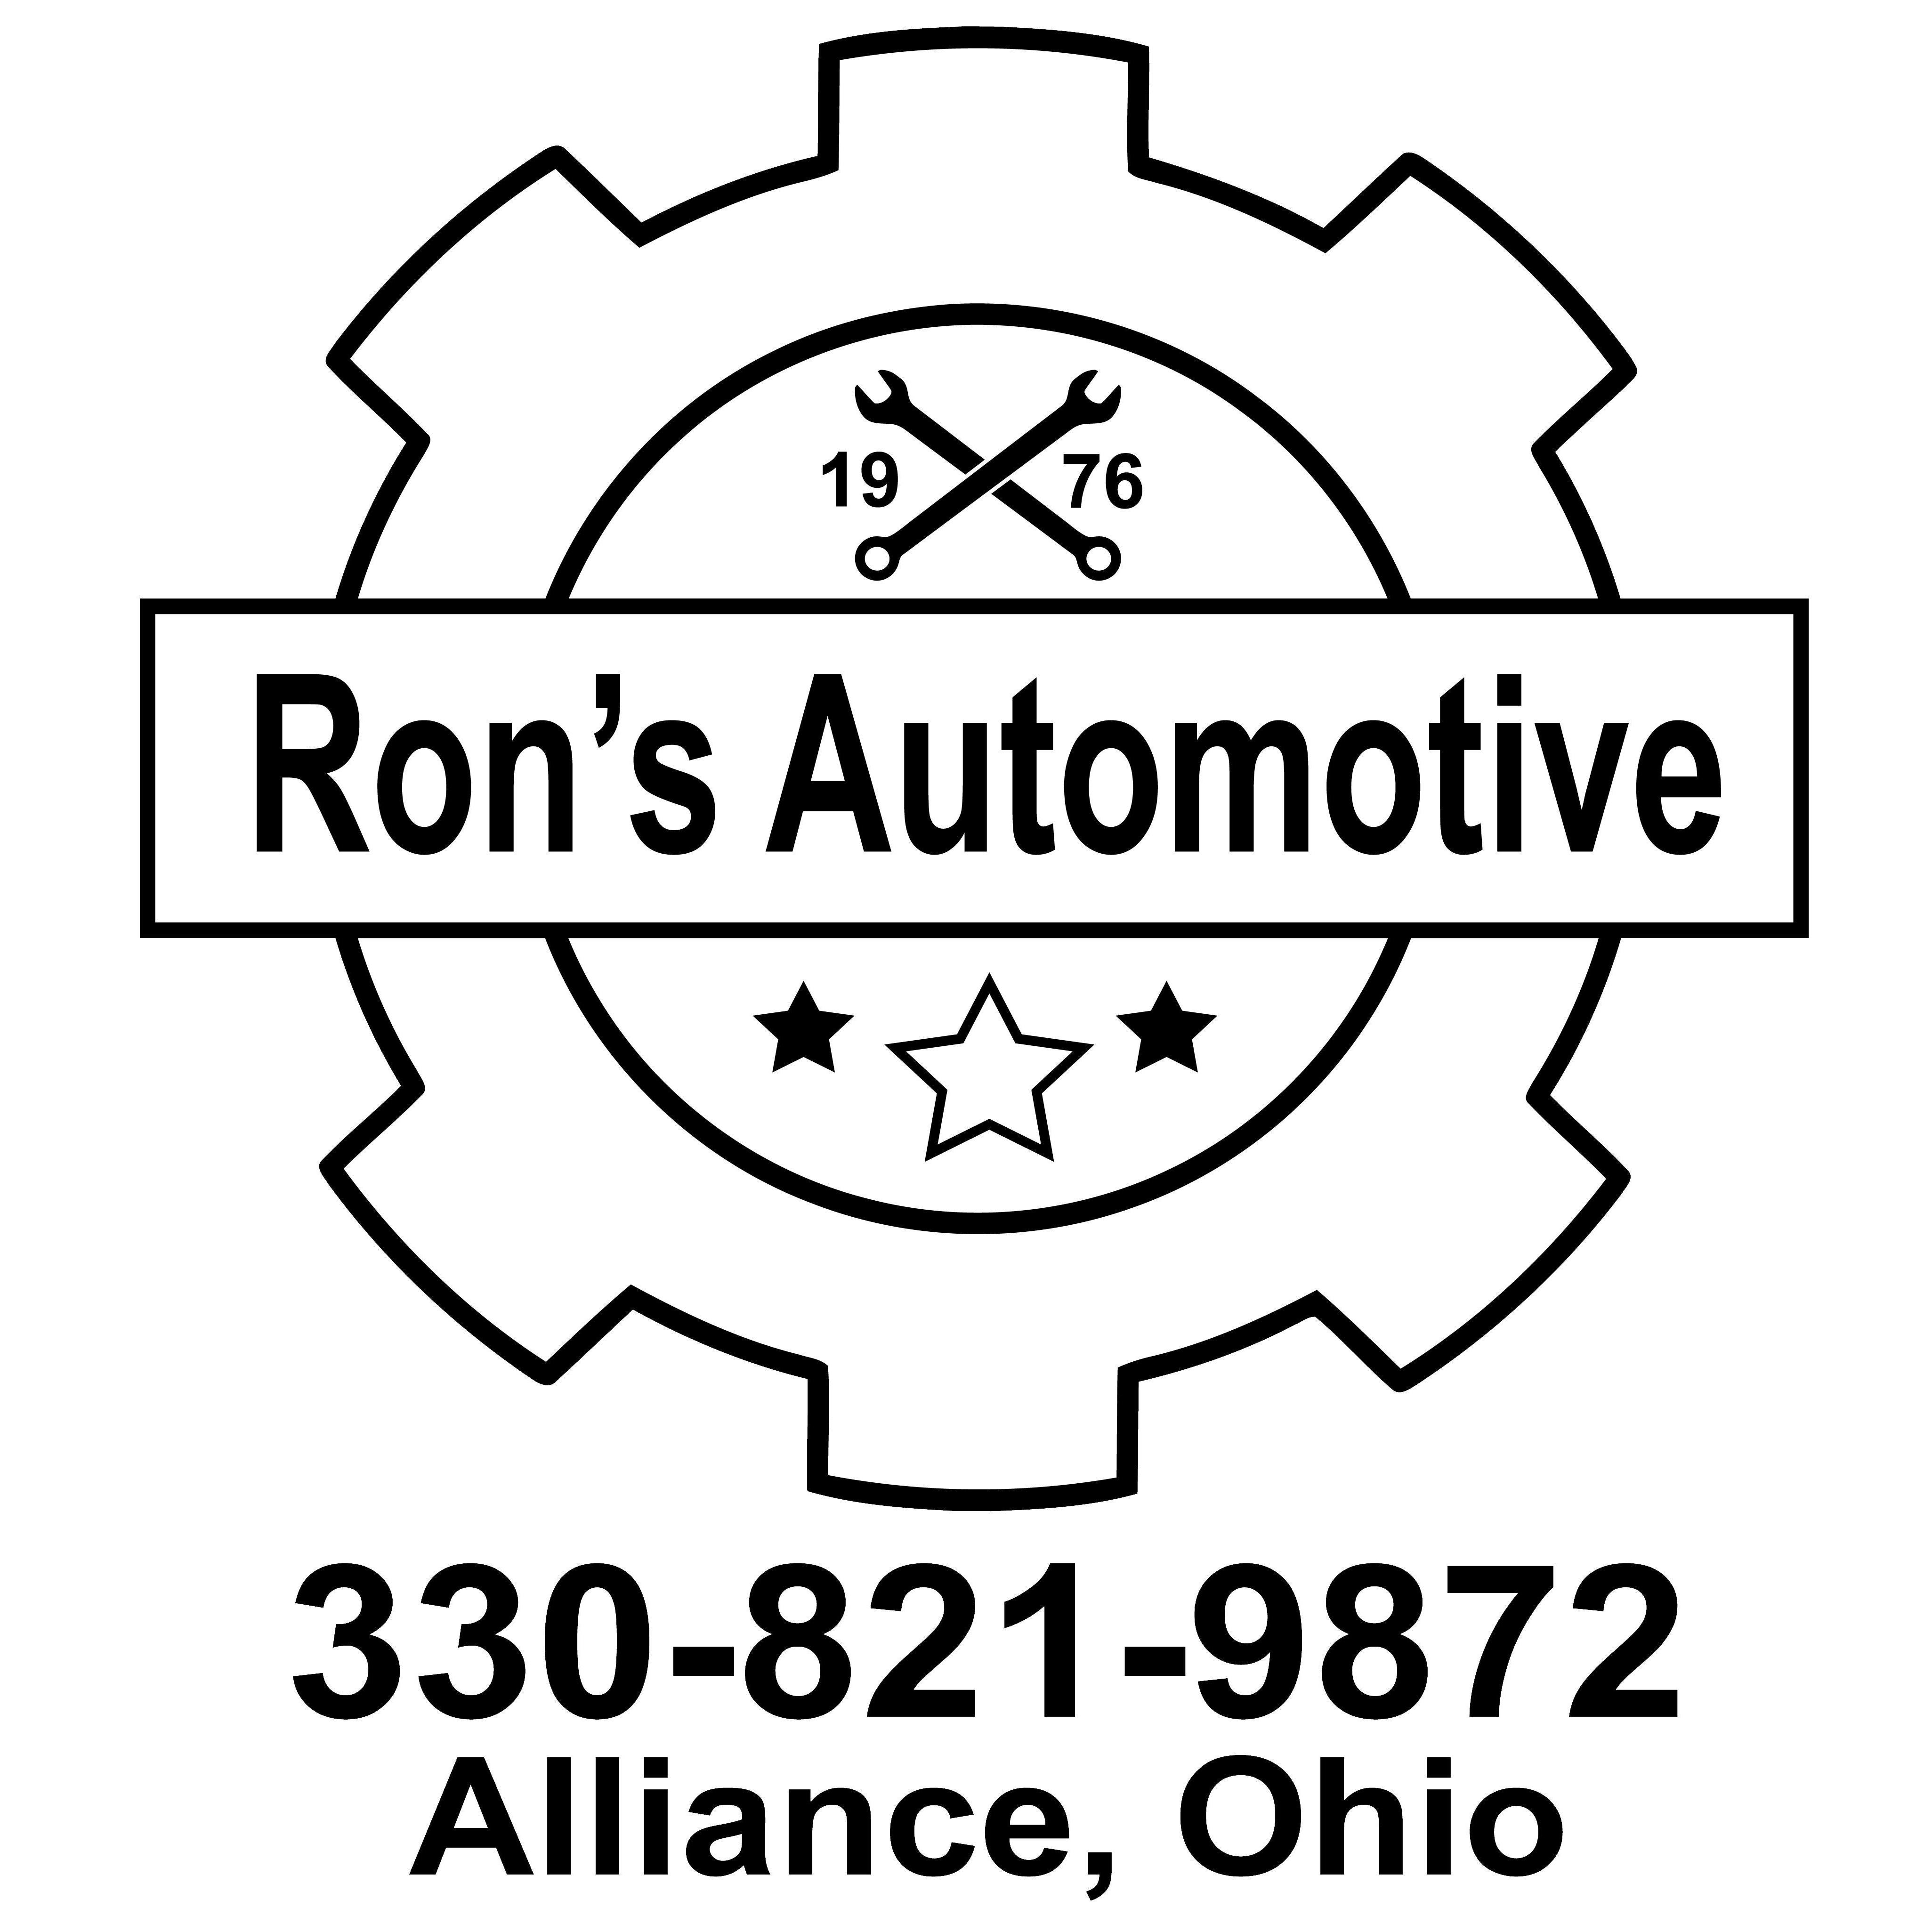 Ron's Automotive Services - Alliance, OH - General Auto Repair & Service